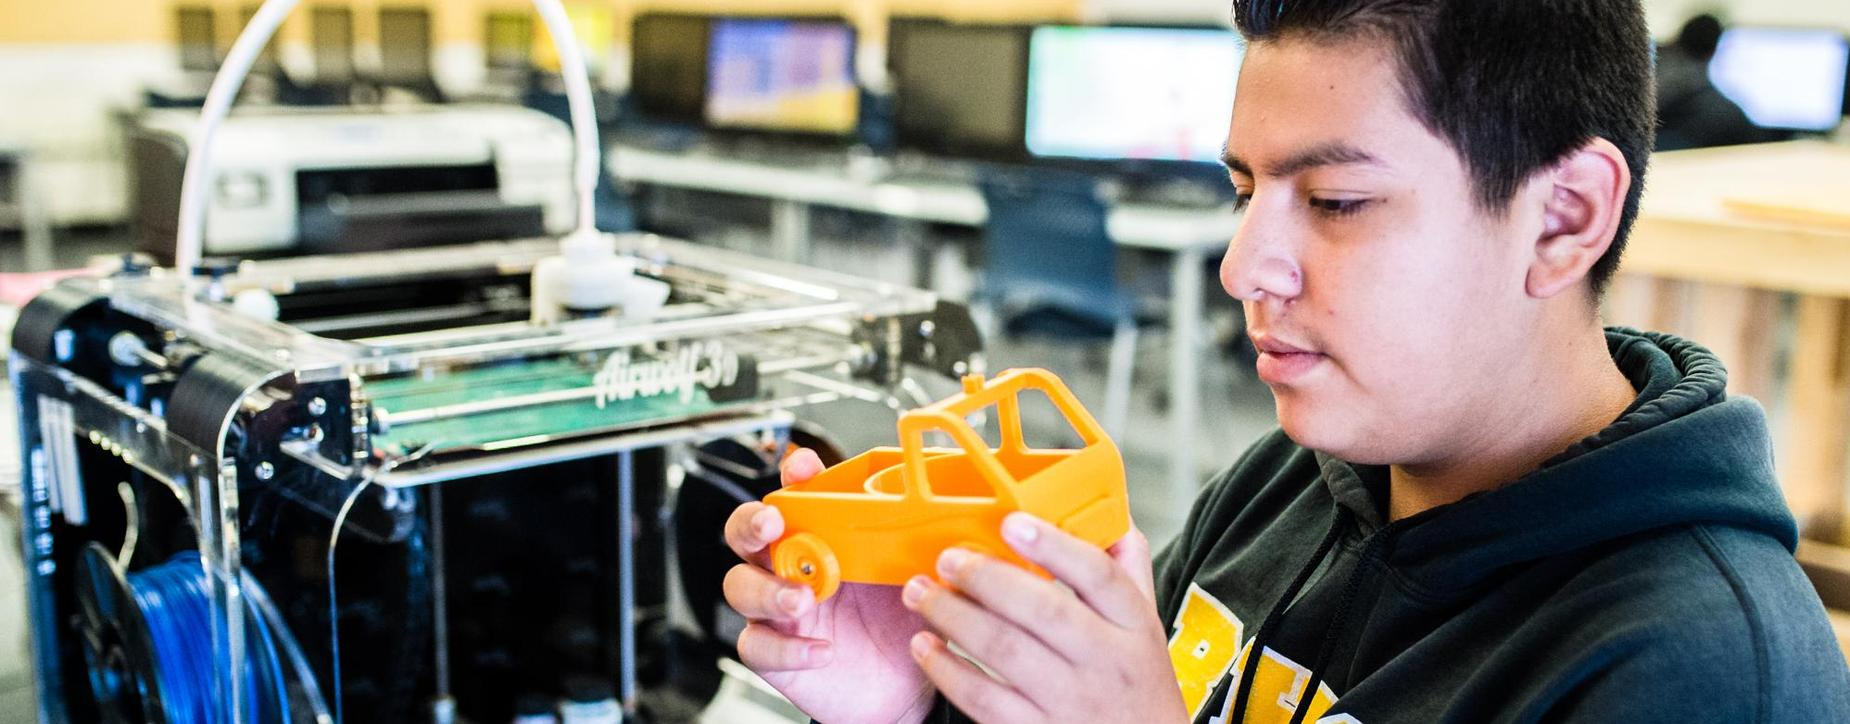 Boy with 3D printer